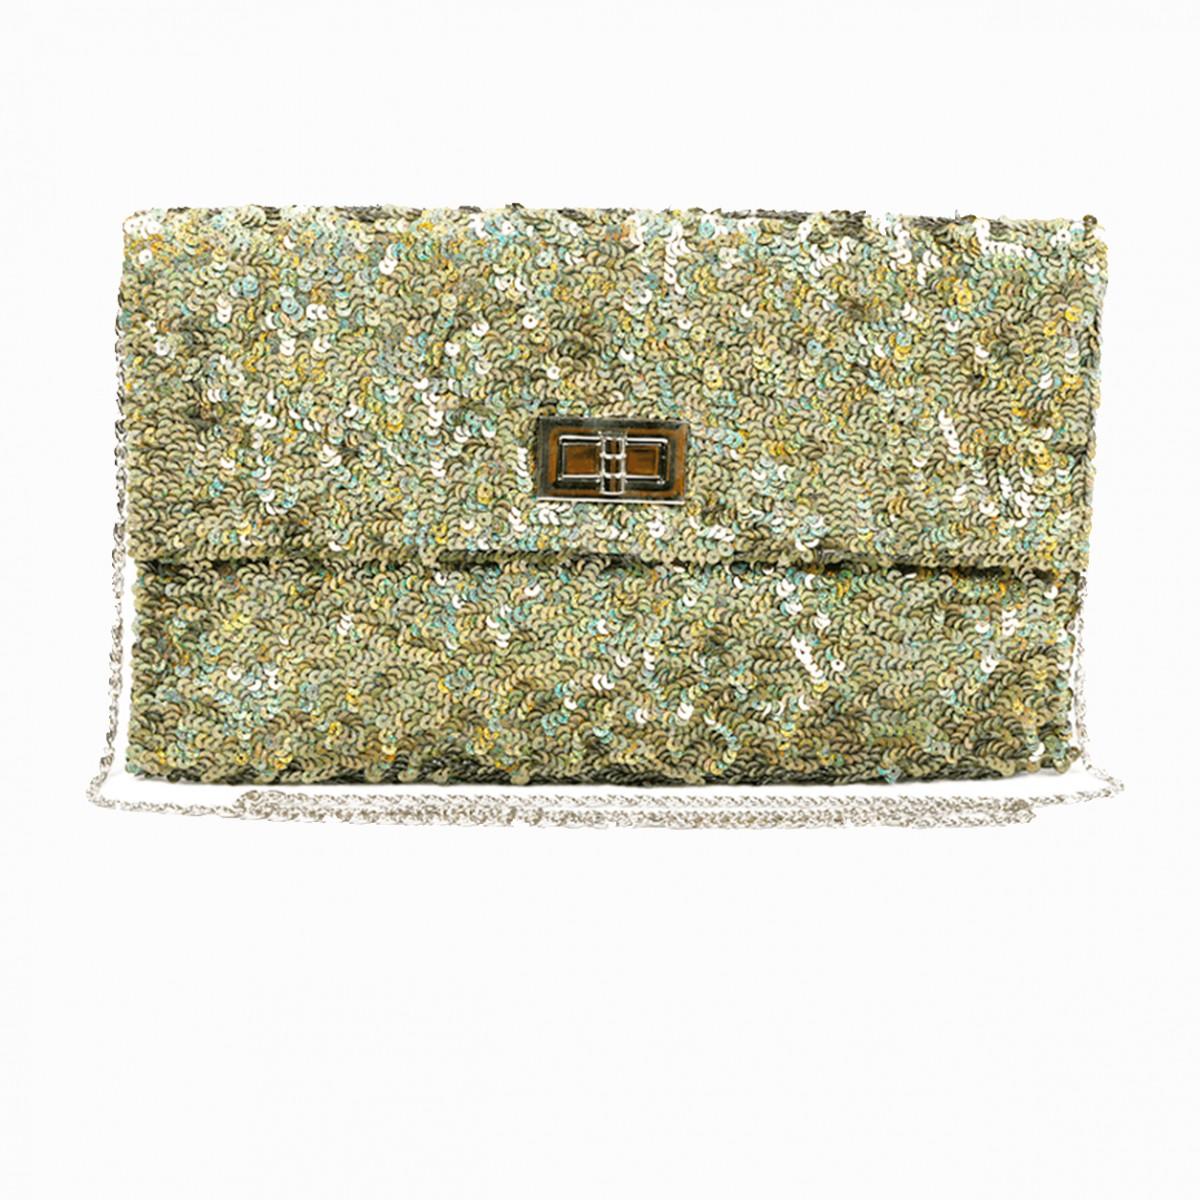 Olive sequins crossbody handbag